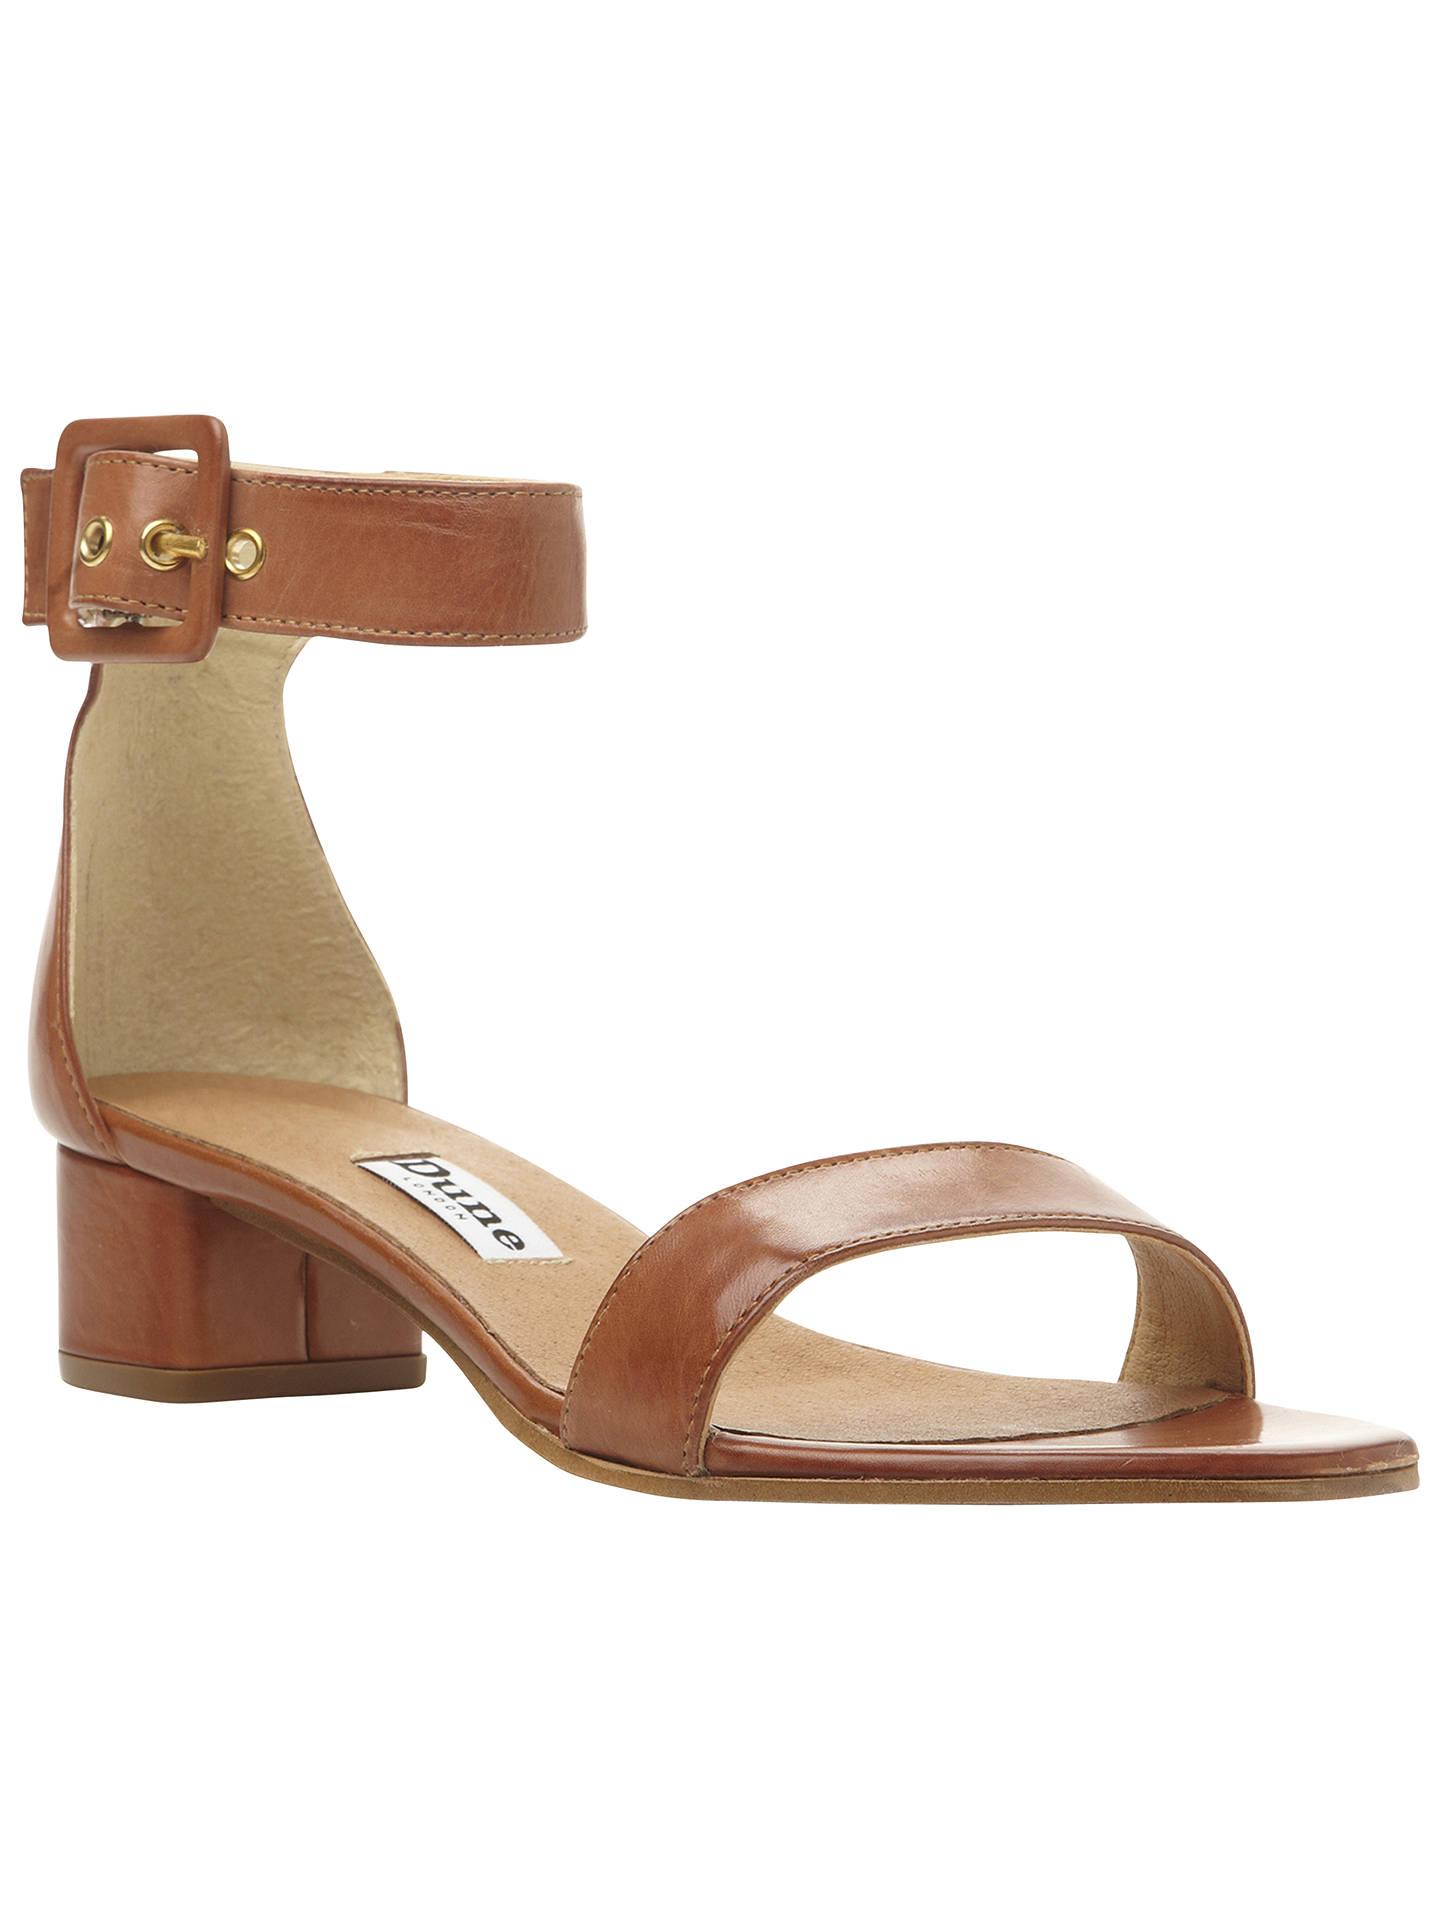 e42afbb0baa Buy Dune Fran Two Part Block Heel Sandals, Tan, 3 Online at johnlewis.